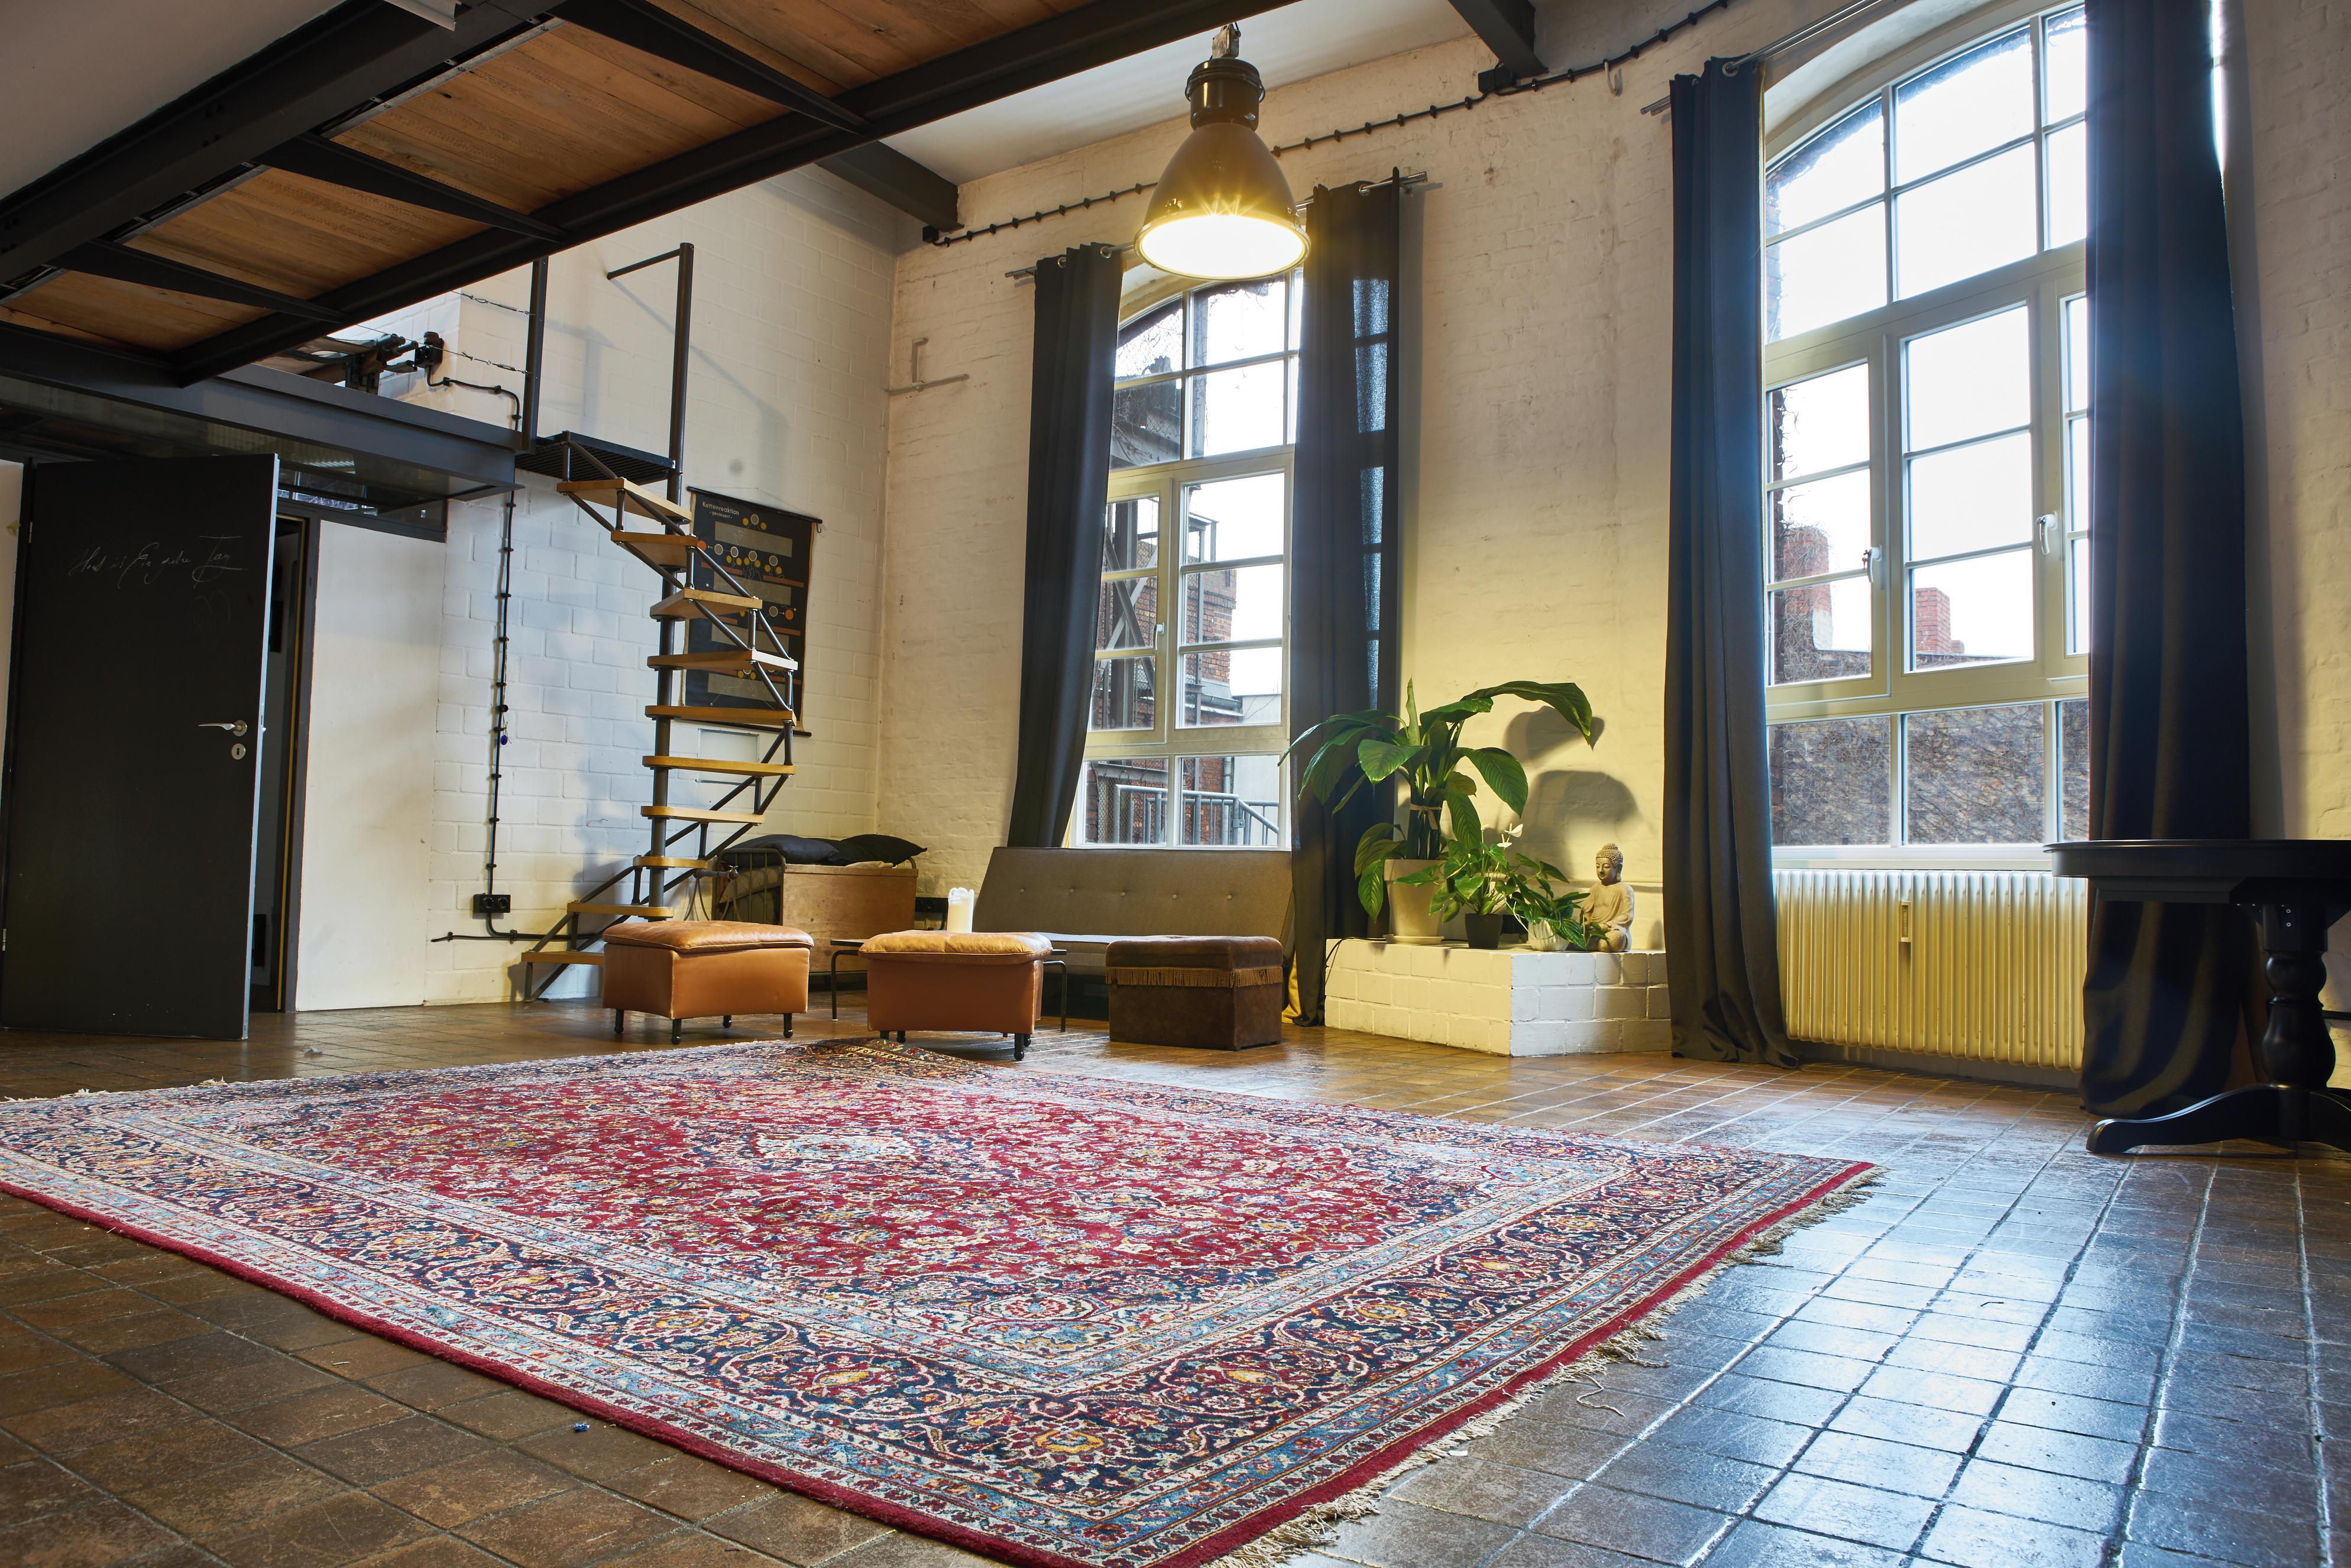 mieten in berlin. Black Bedroom Furniture Sets. Home Design Ideas